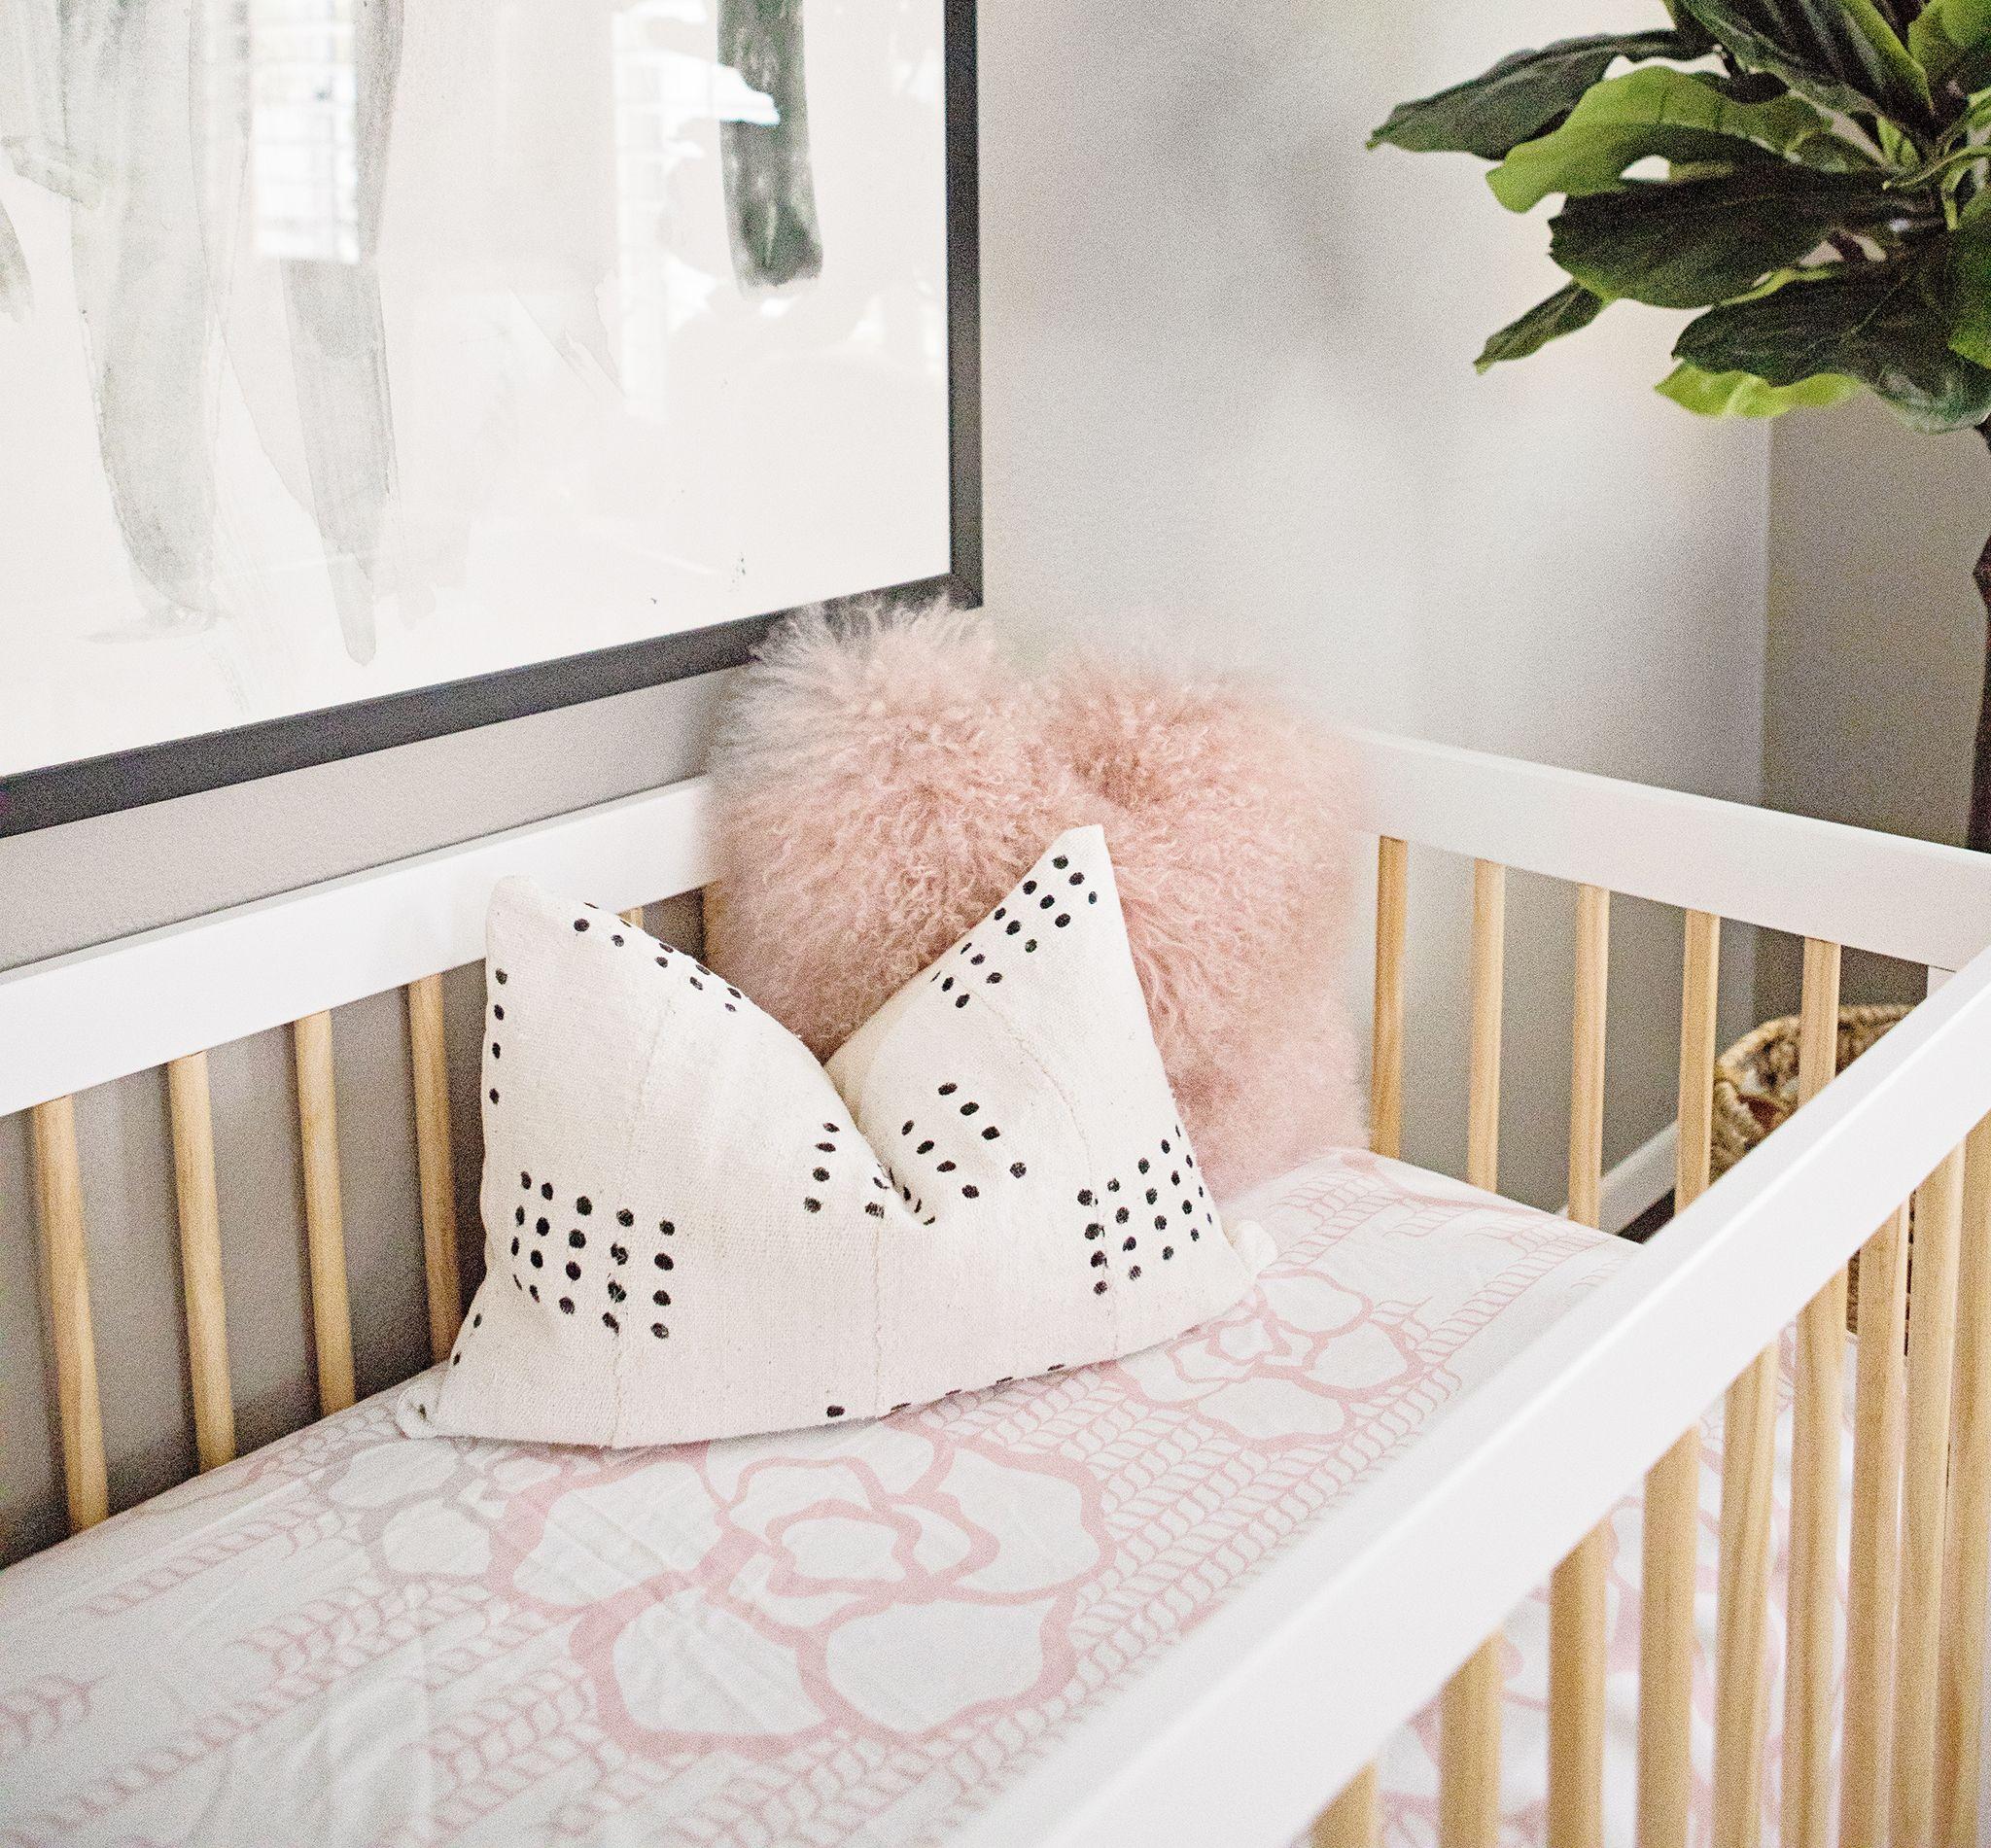 celebrity design reveal tamera mowry's nursery  white crib  - find the bedding in the project nursery shop  oilo capri crib bedding in